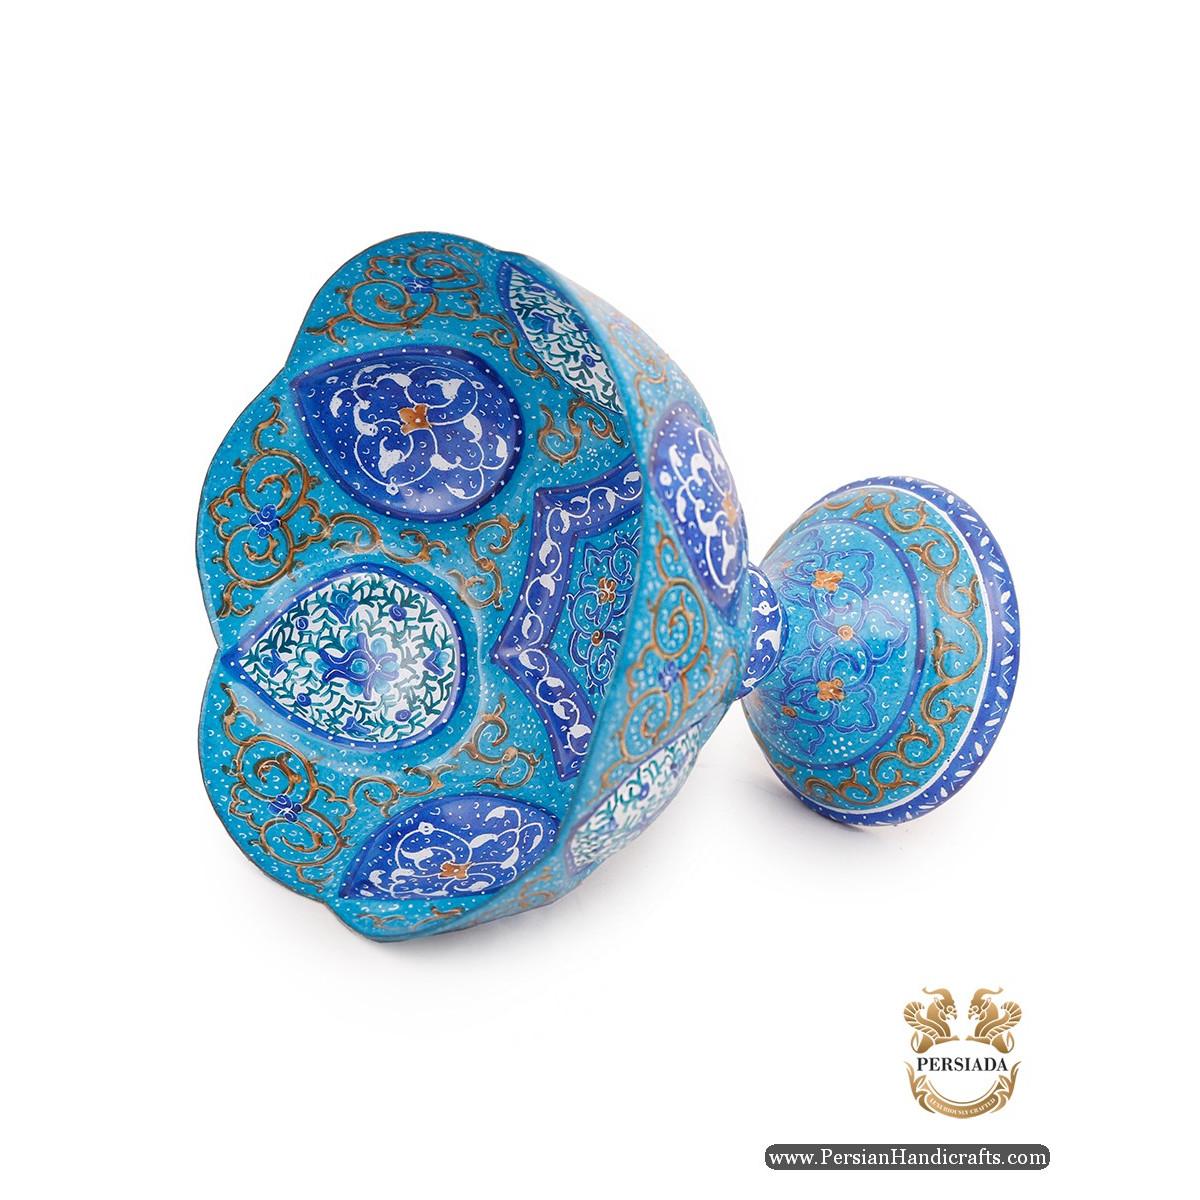 Pedestal Dish | Hand Painted Minakari | Persiada HE6101